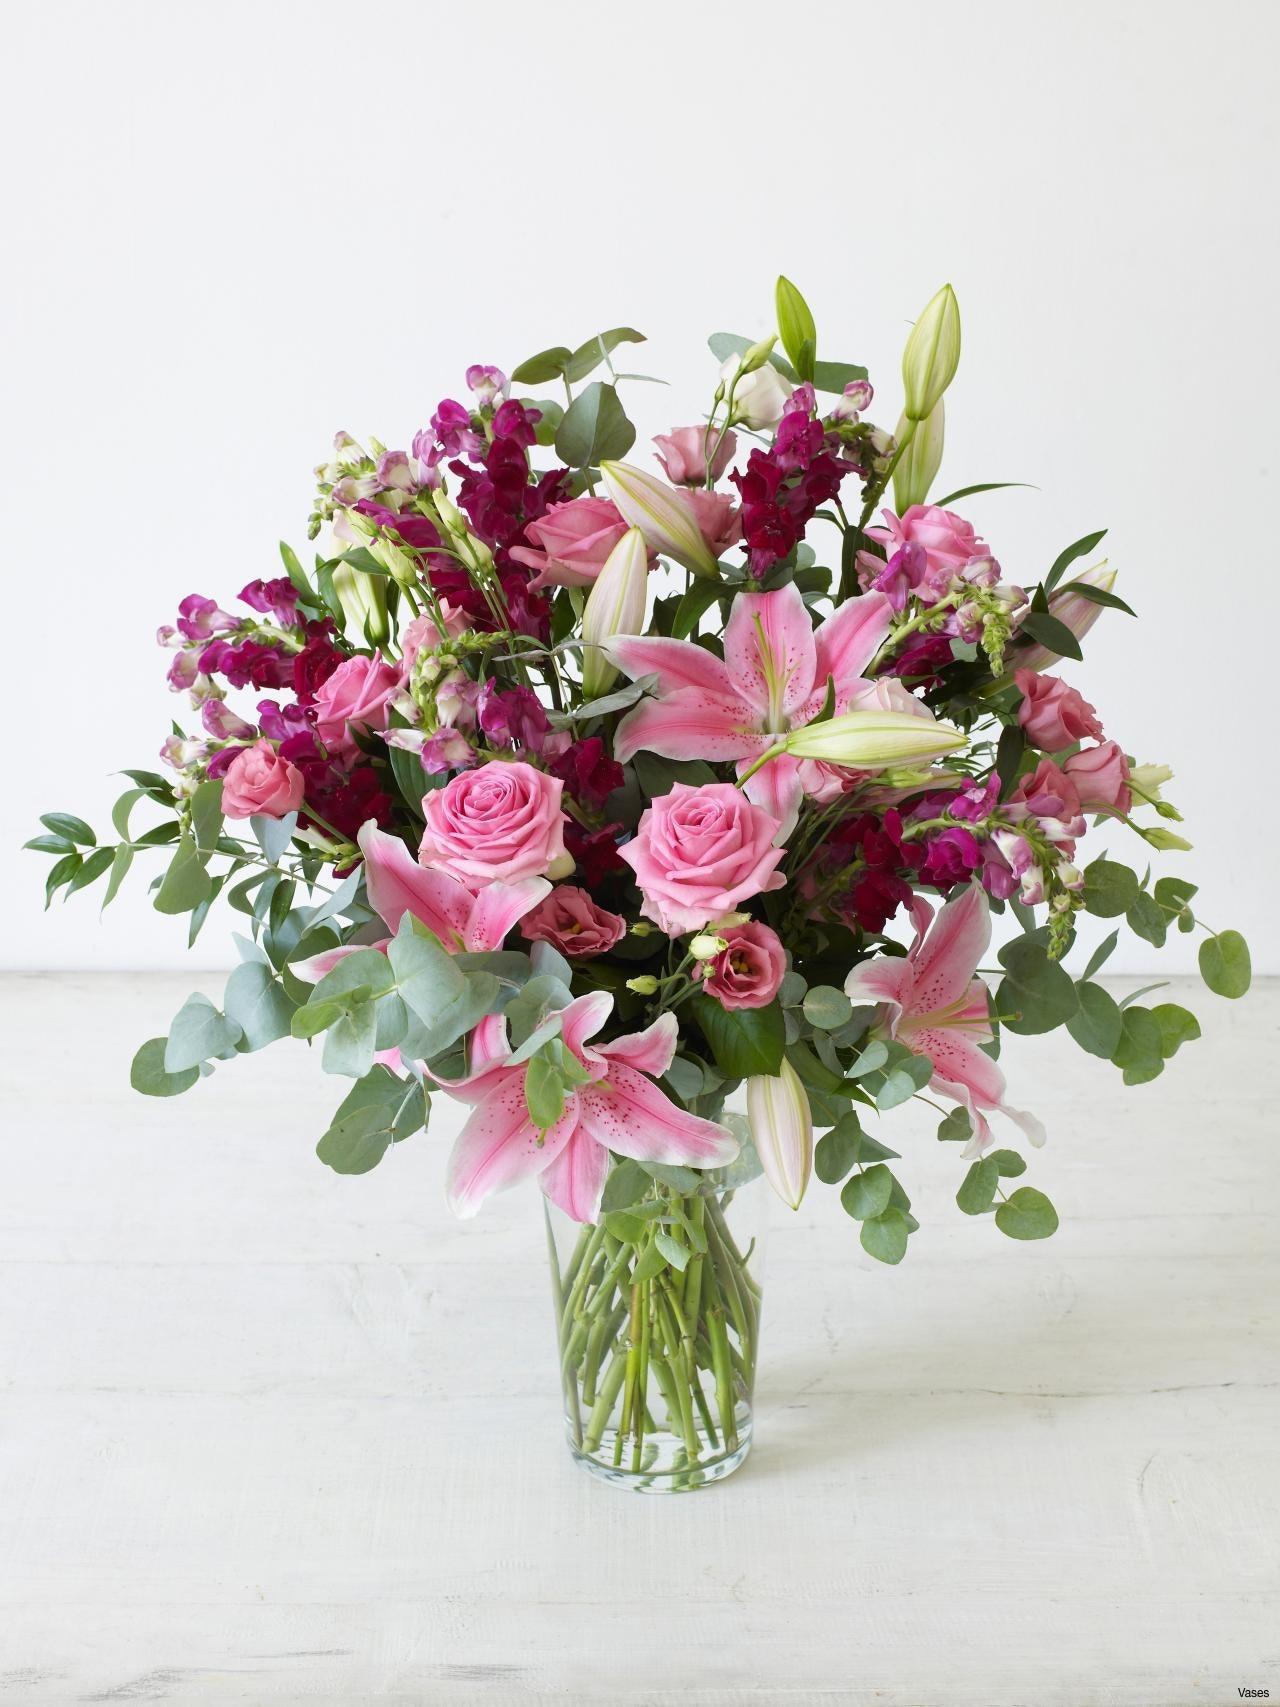 Flower Arrangements Elegant Floral Arrangements 0d Design Ideas Scheme Silk Flower Wedding